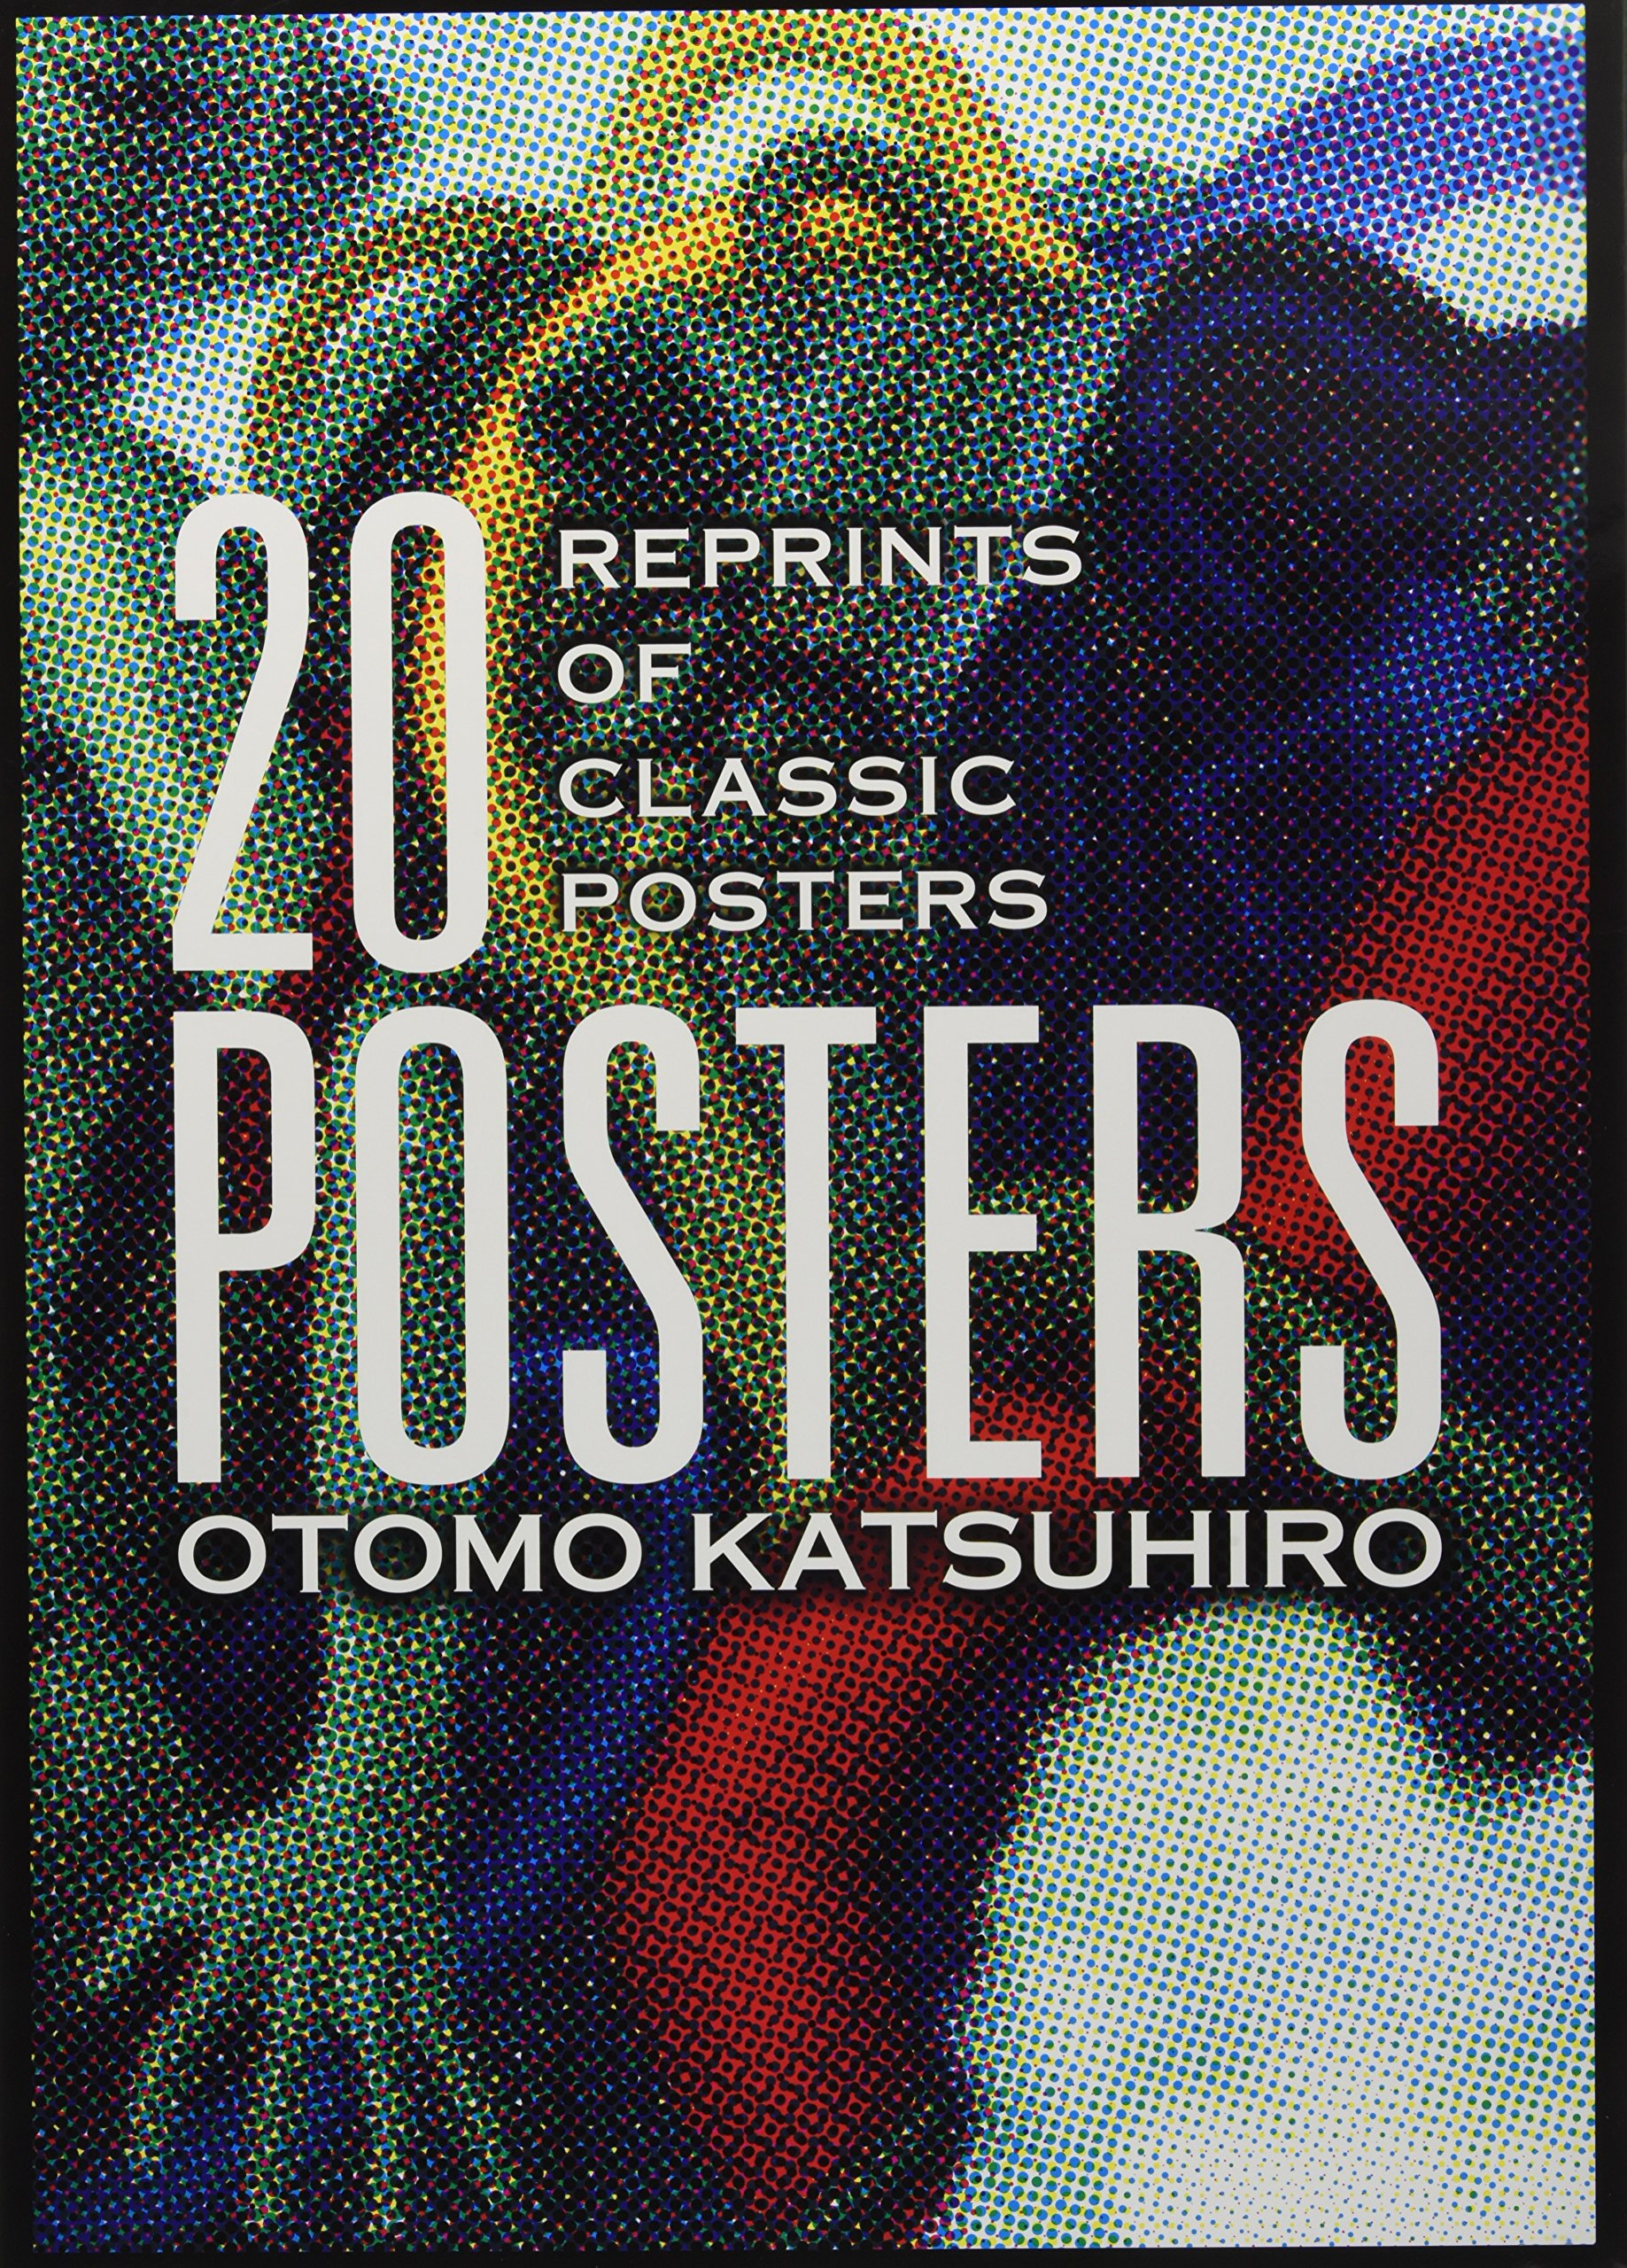 Otomo Katsuhiro  20 Posters Reprints Of Classic Posters